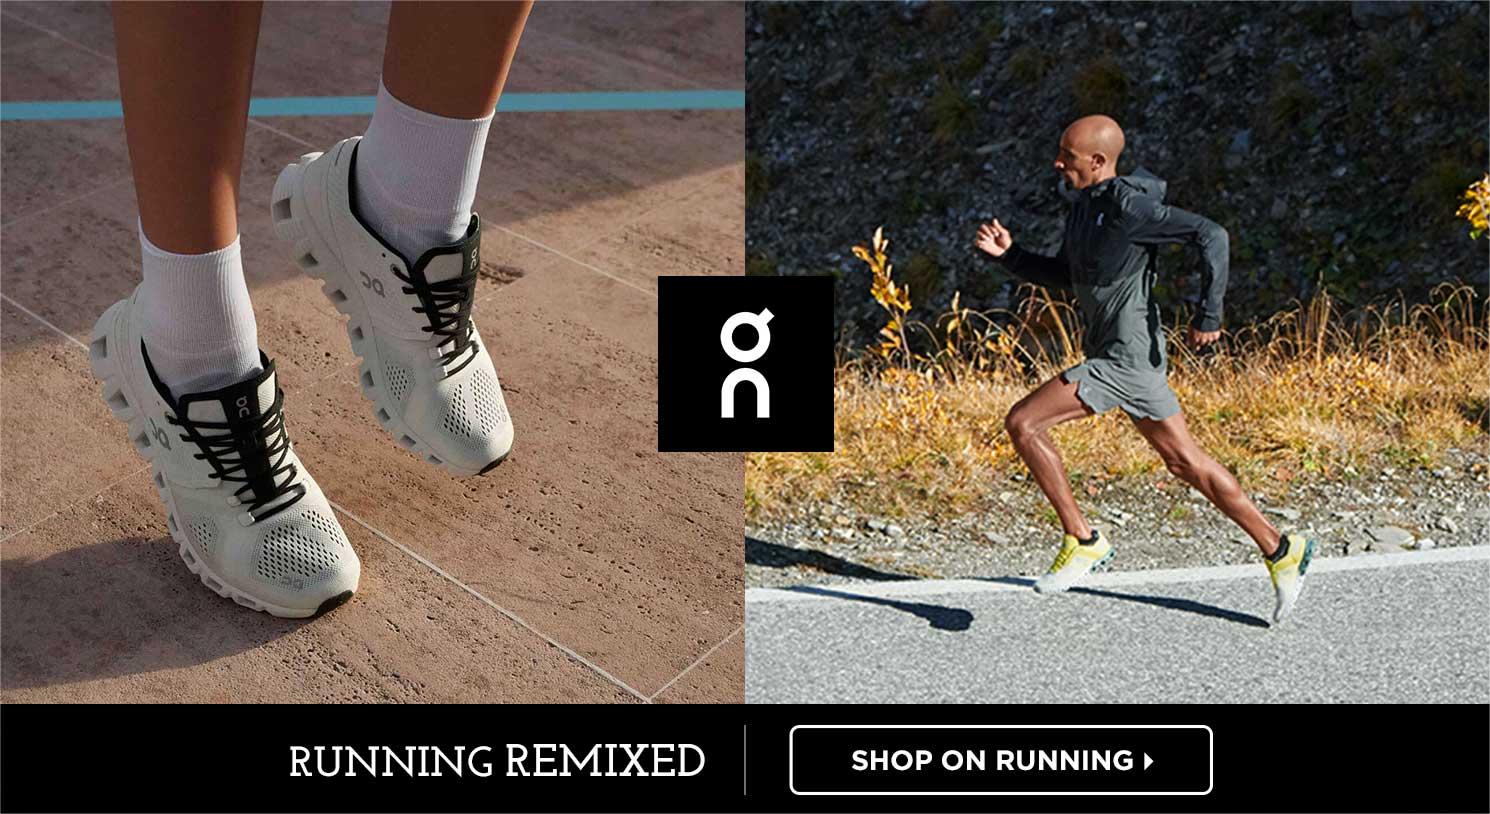 On: Running Remixed